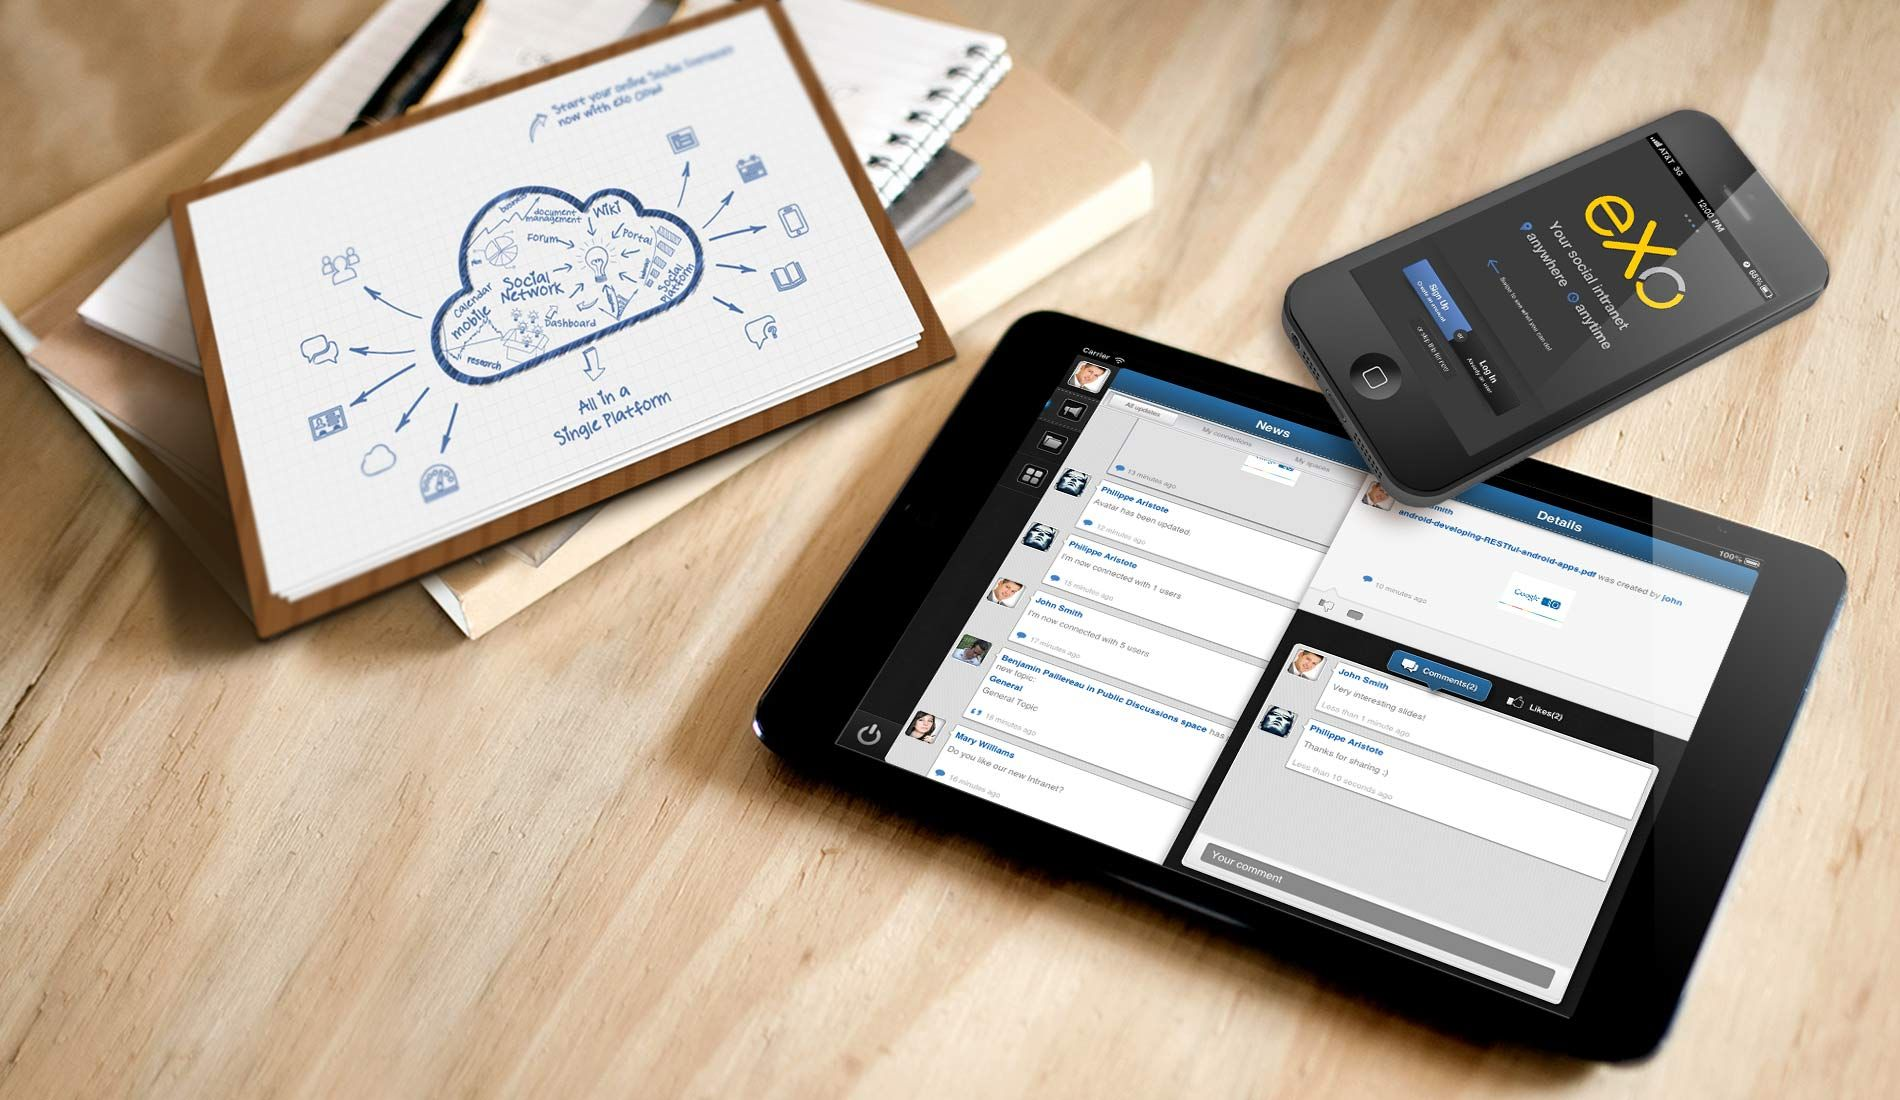 Open Source Enterprise Social Network and Enterprise Portal